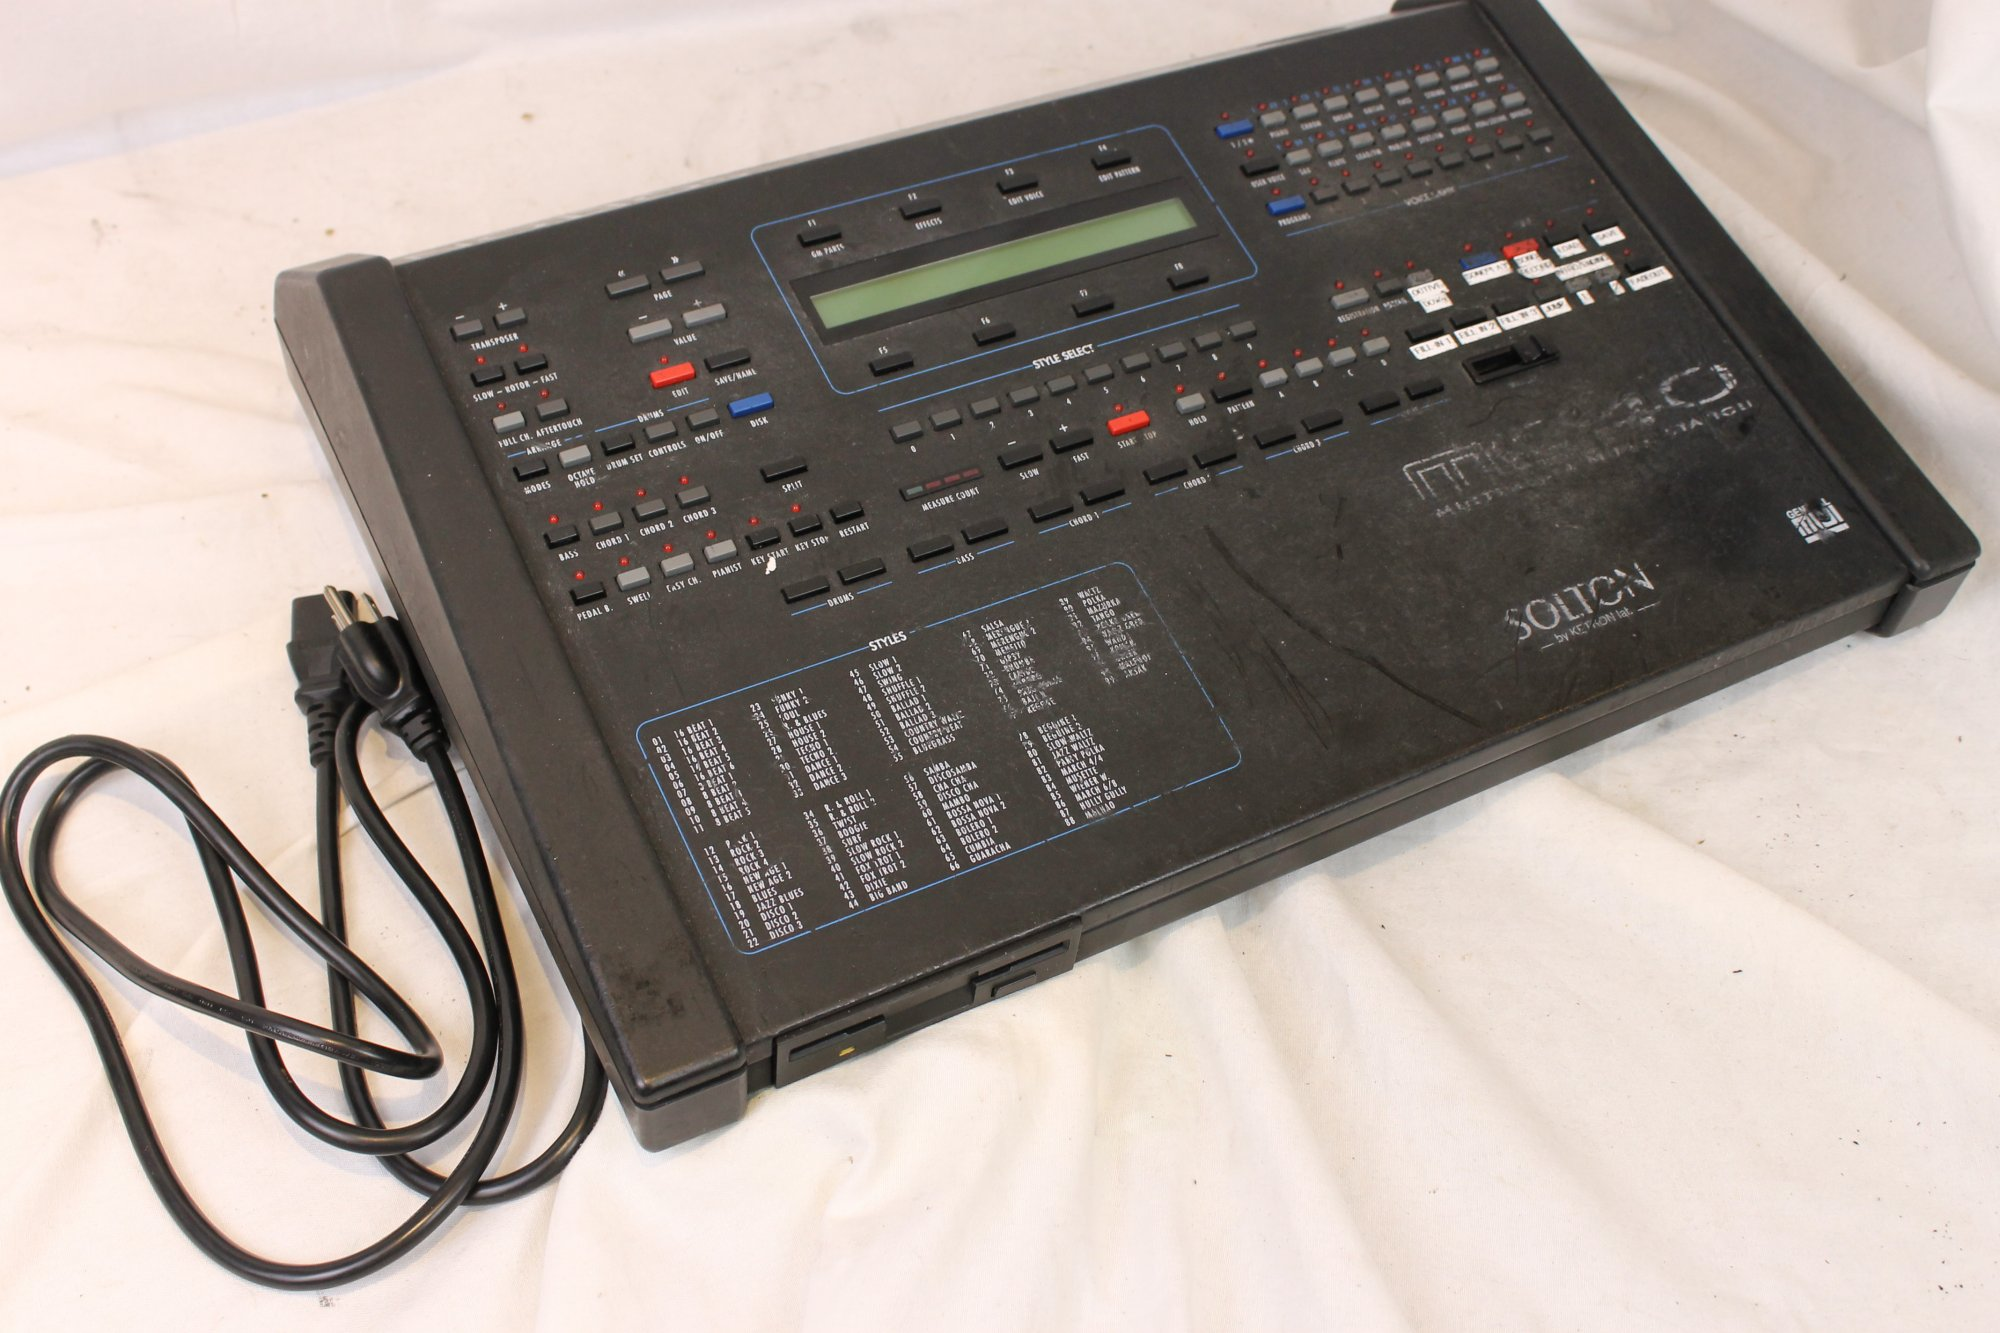 3374 - Ketron Solton MS40 Multimedia Music Station Midi Module